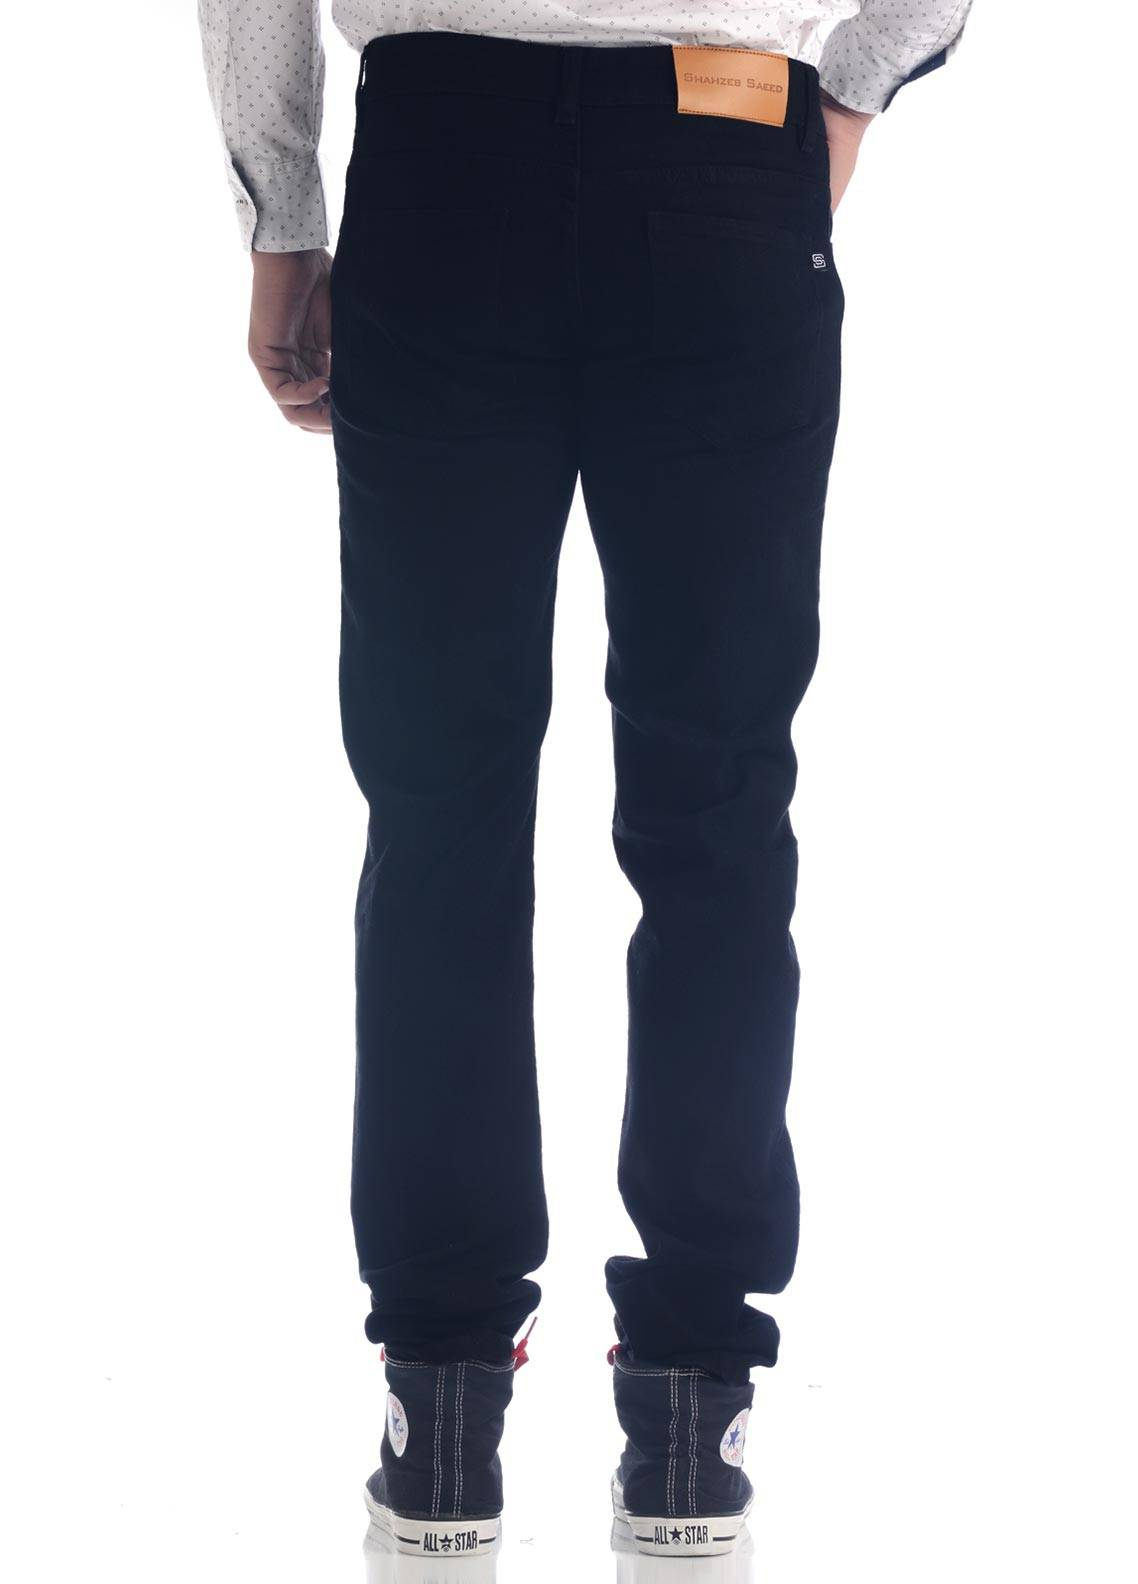 Shahzeb Saeed Denim Casual Jeans for Men - Black DNM-92